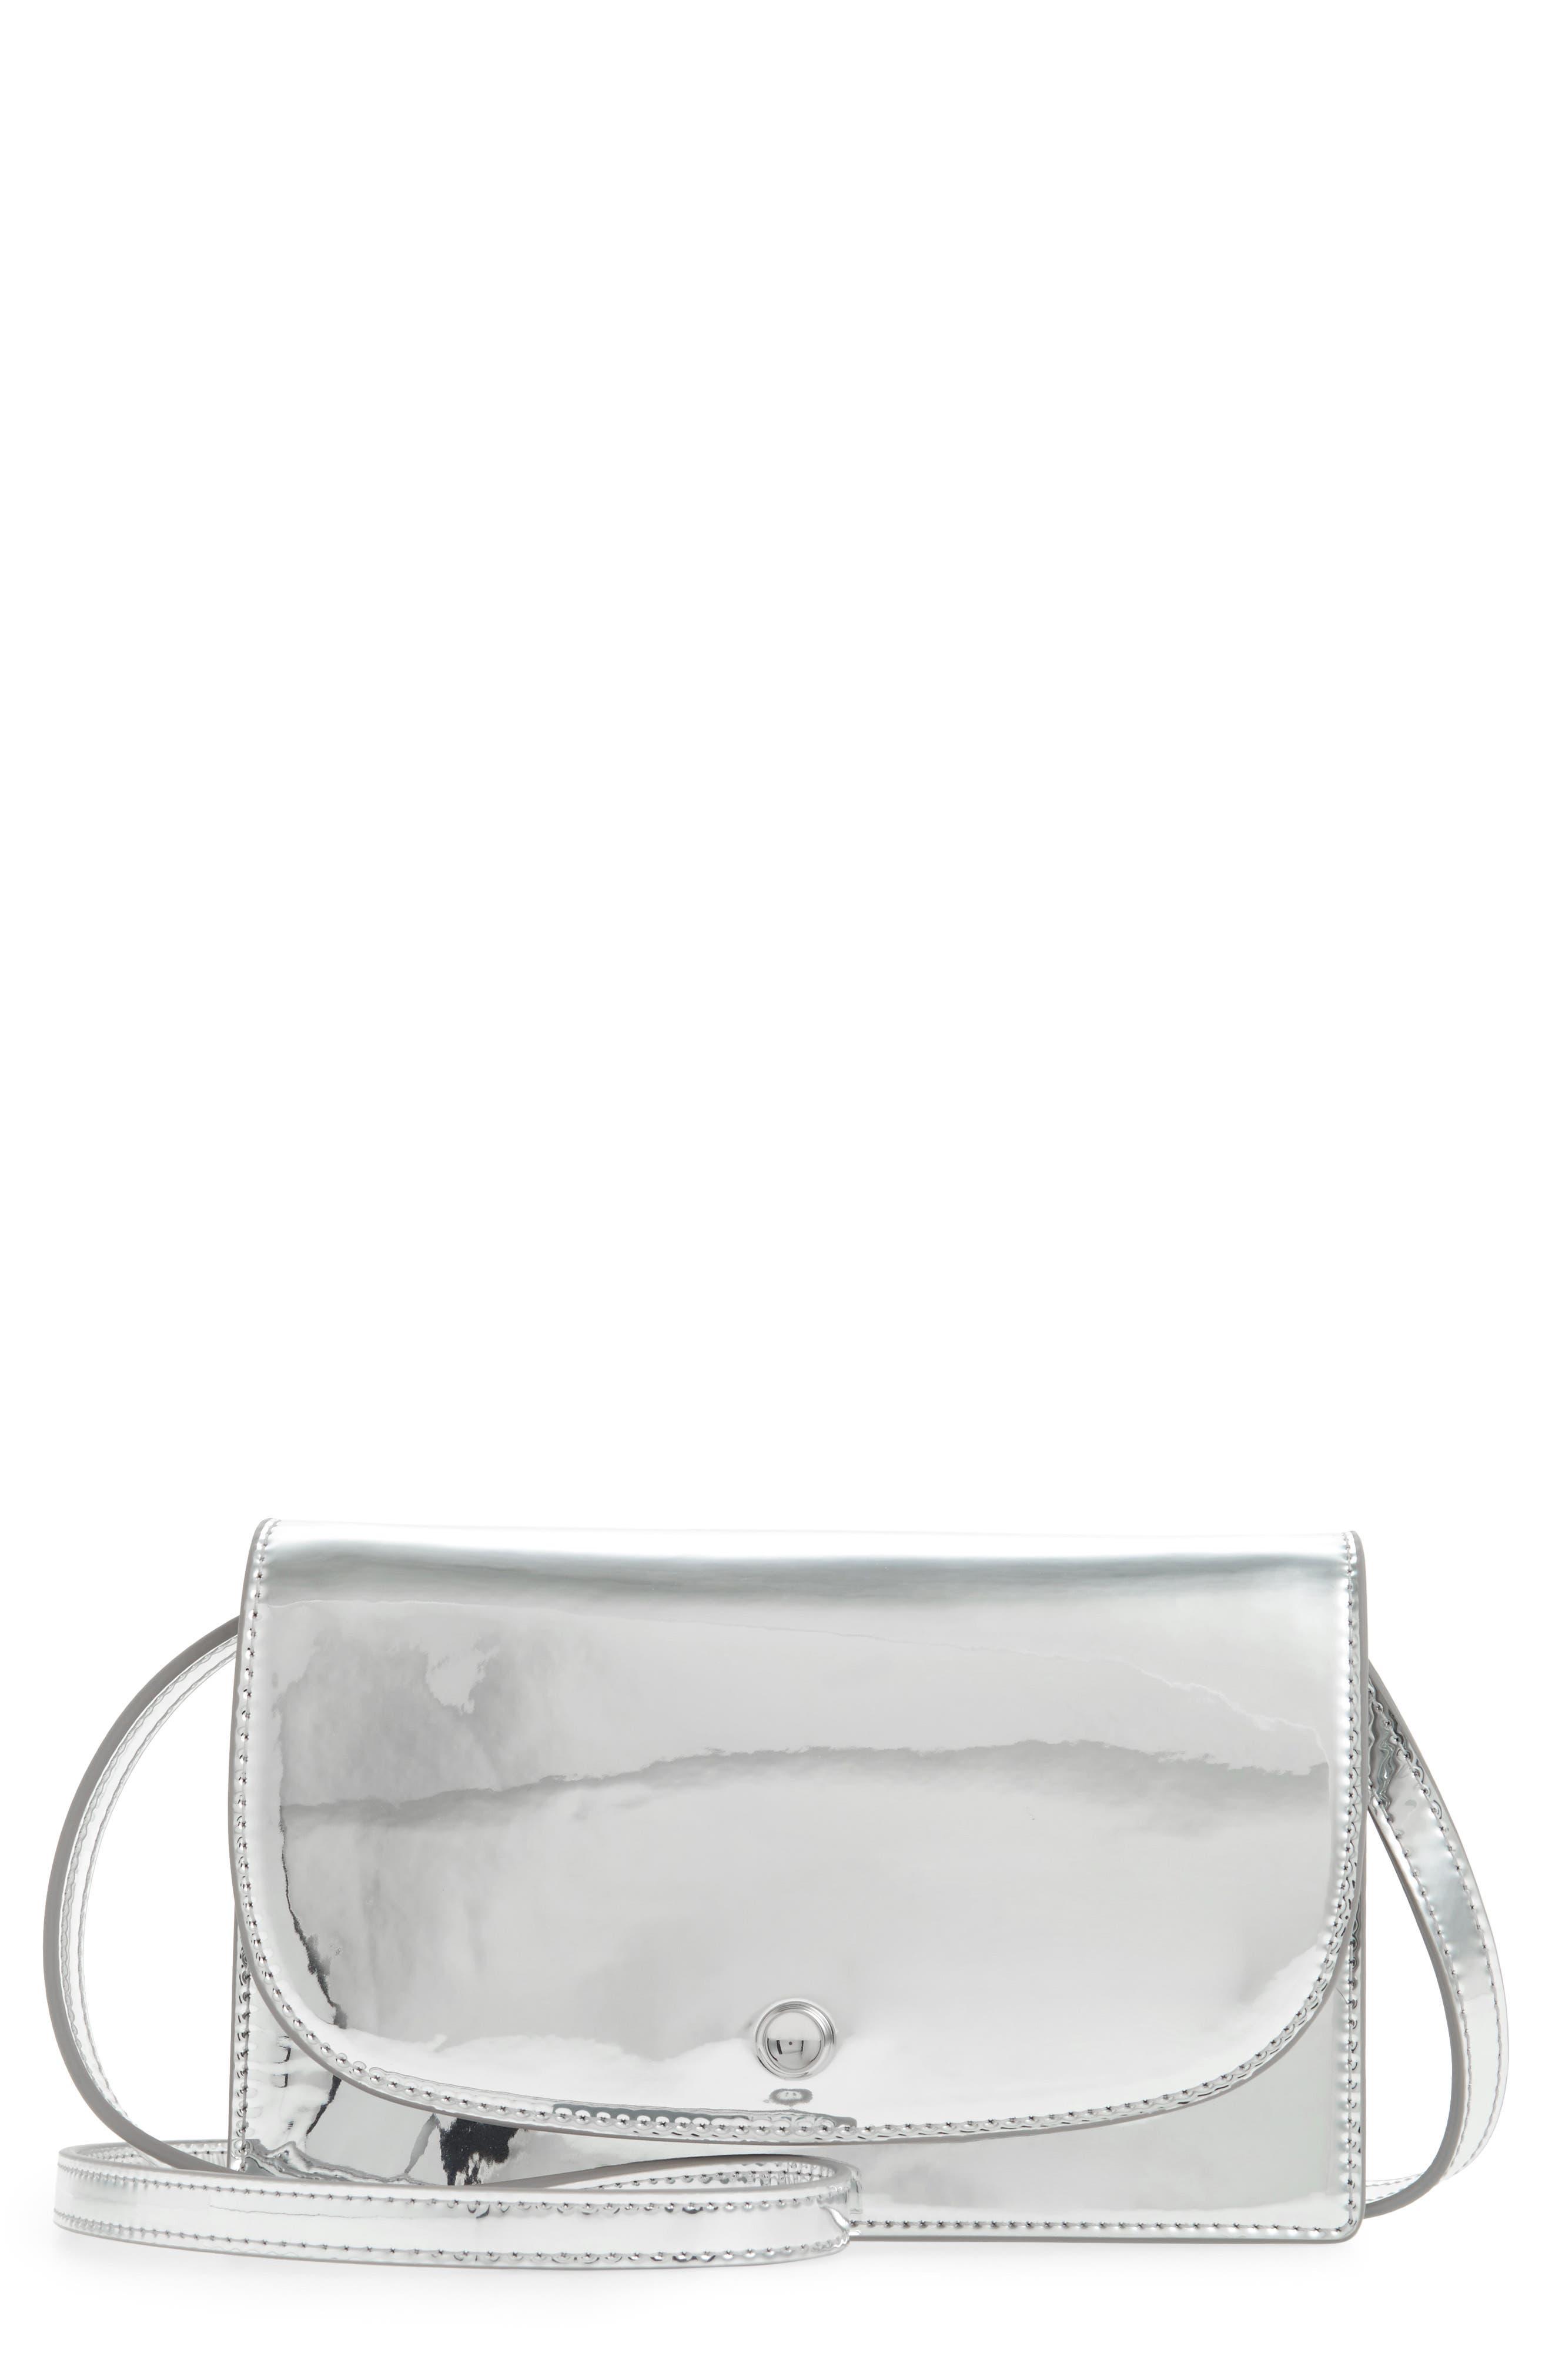 Mini Eloise Crossbody Bag,                             Main thumbnail 1, color,                             Liquid Silver